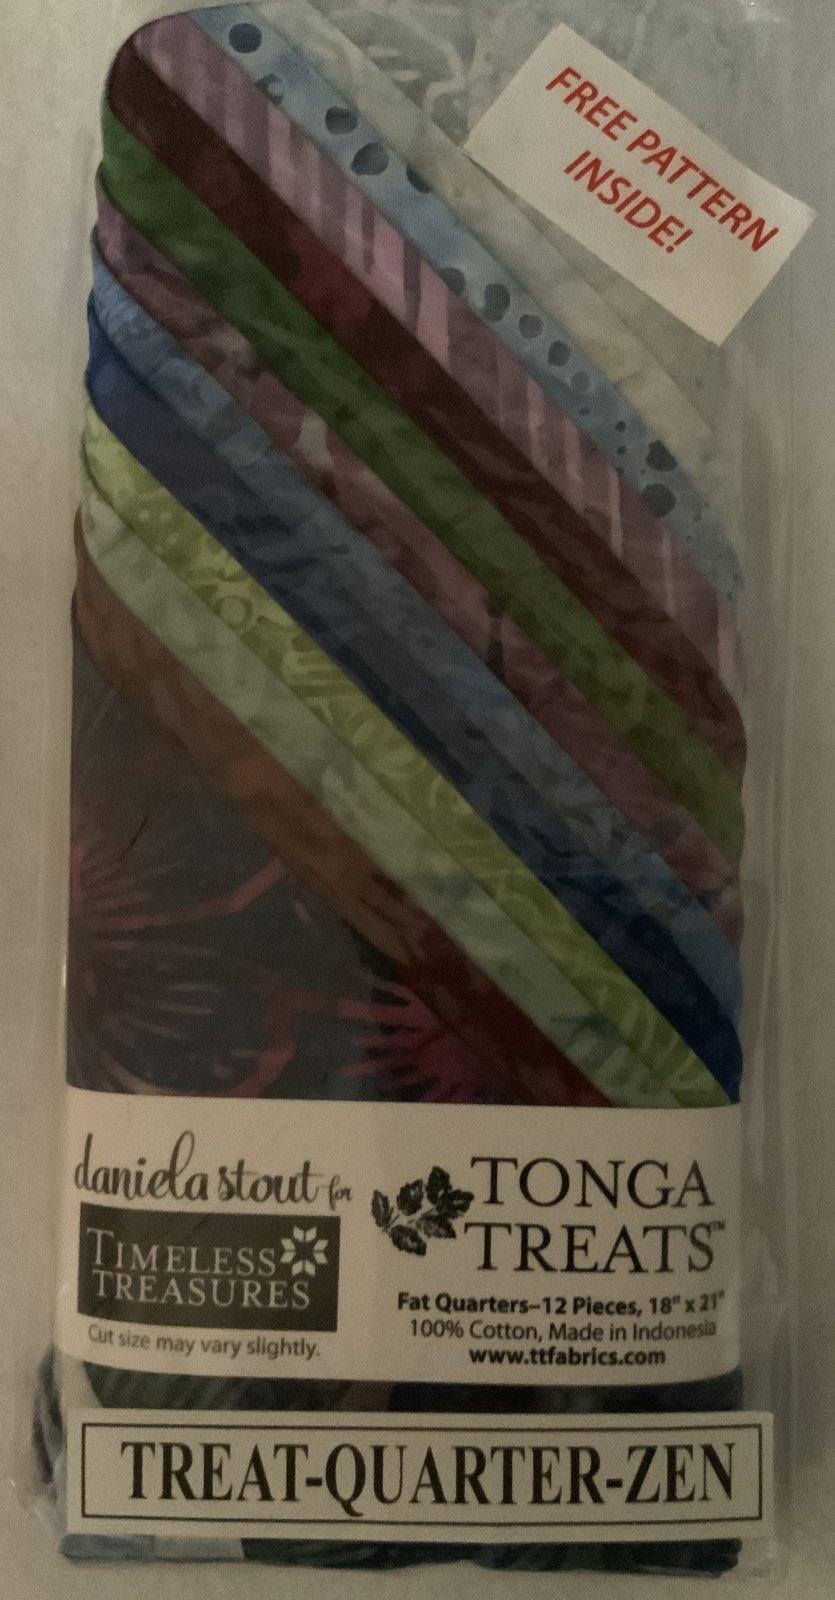 Tonga Treat Fat Quarters Zen (18in x 21in) 12pcs - Timeless Treasures